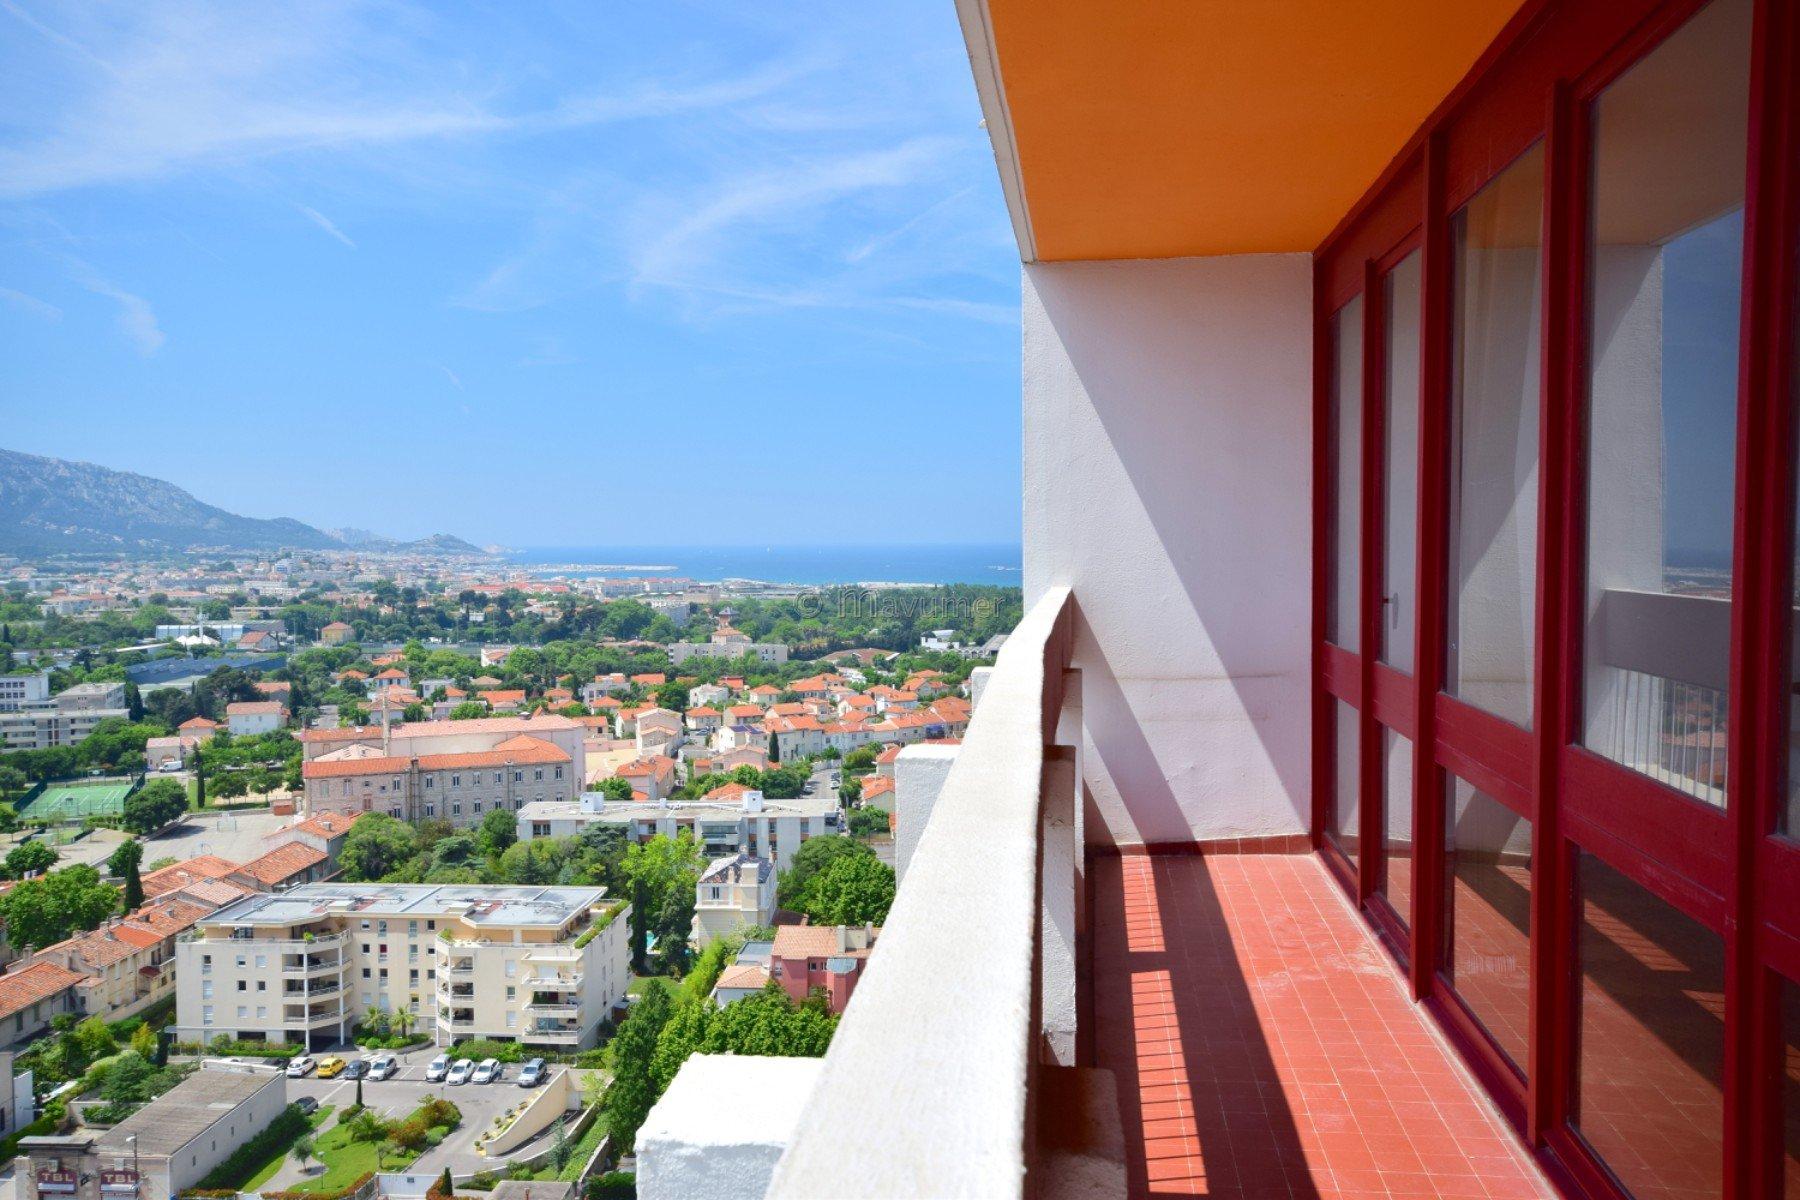 Appartement Duplex T2 vue mer 13008 Marseille LE BRASILIA ST ANNE